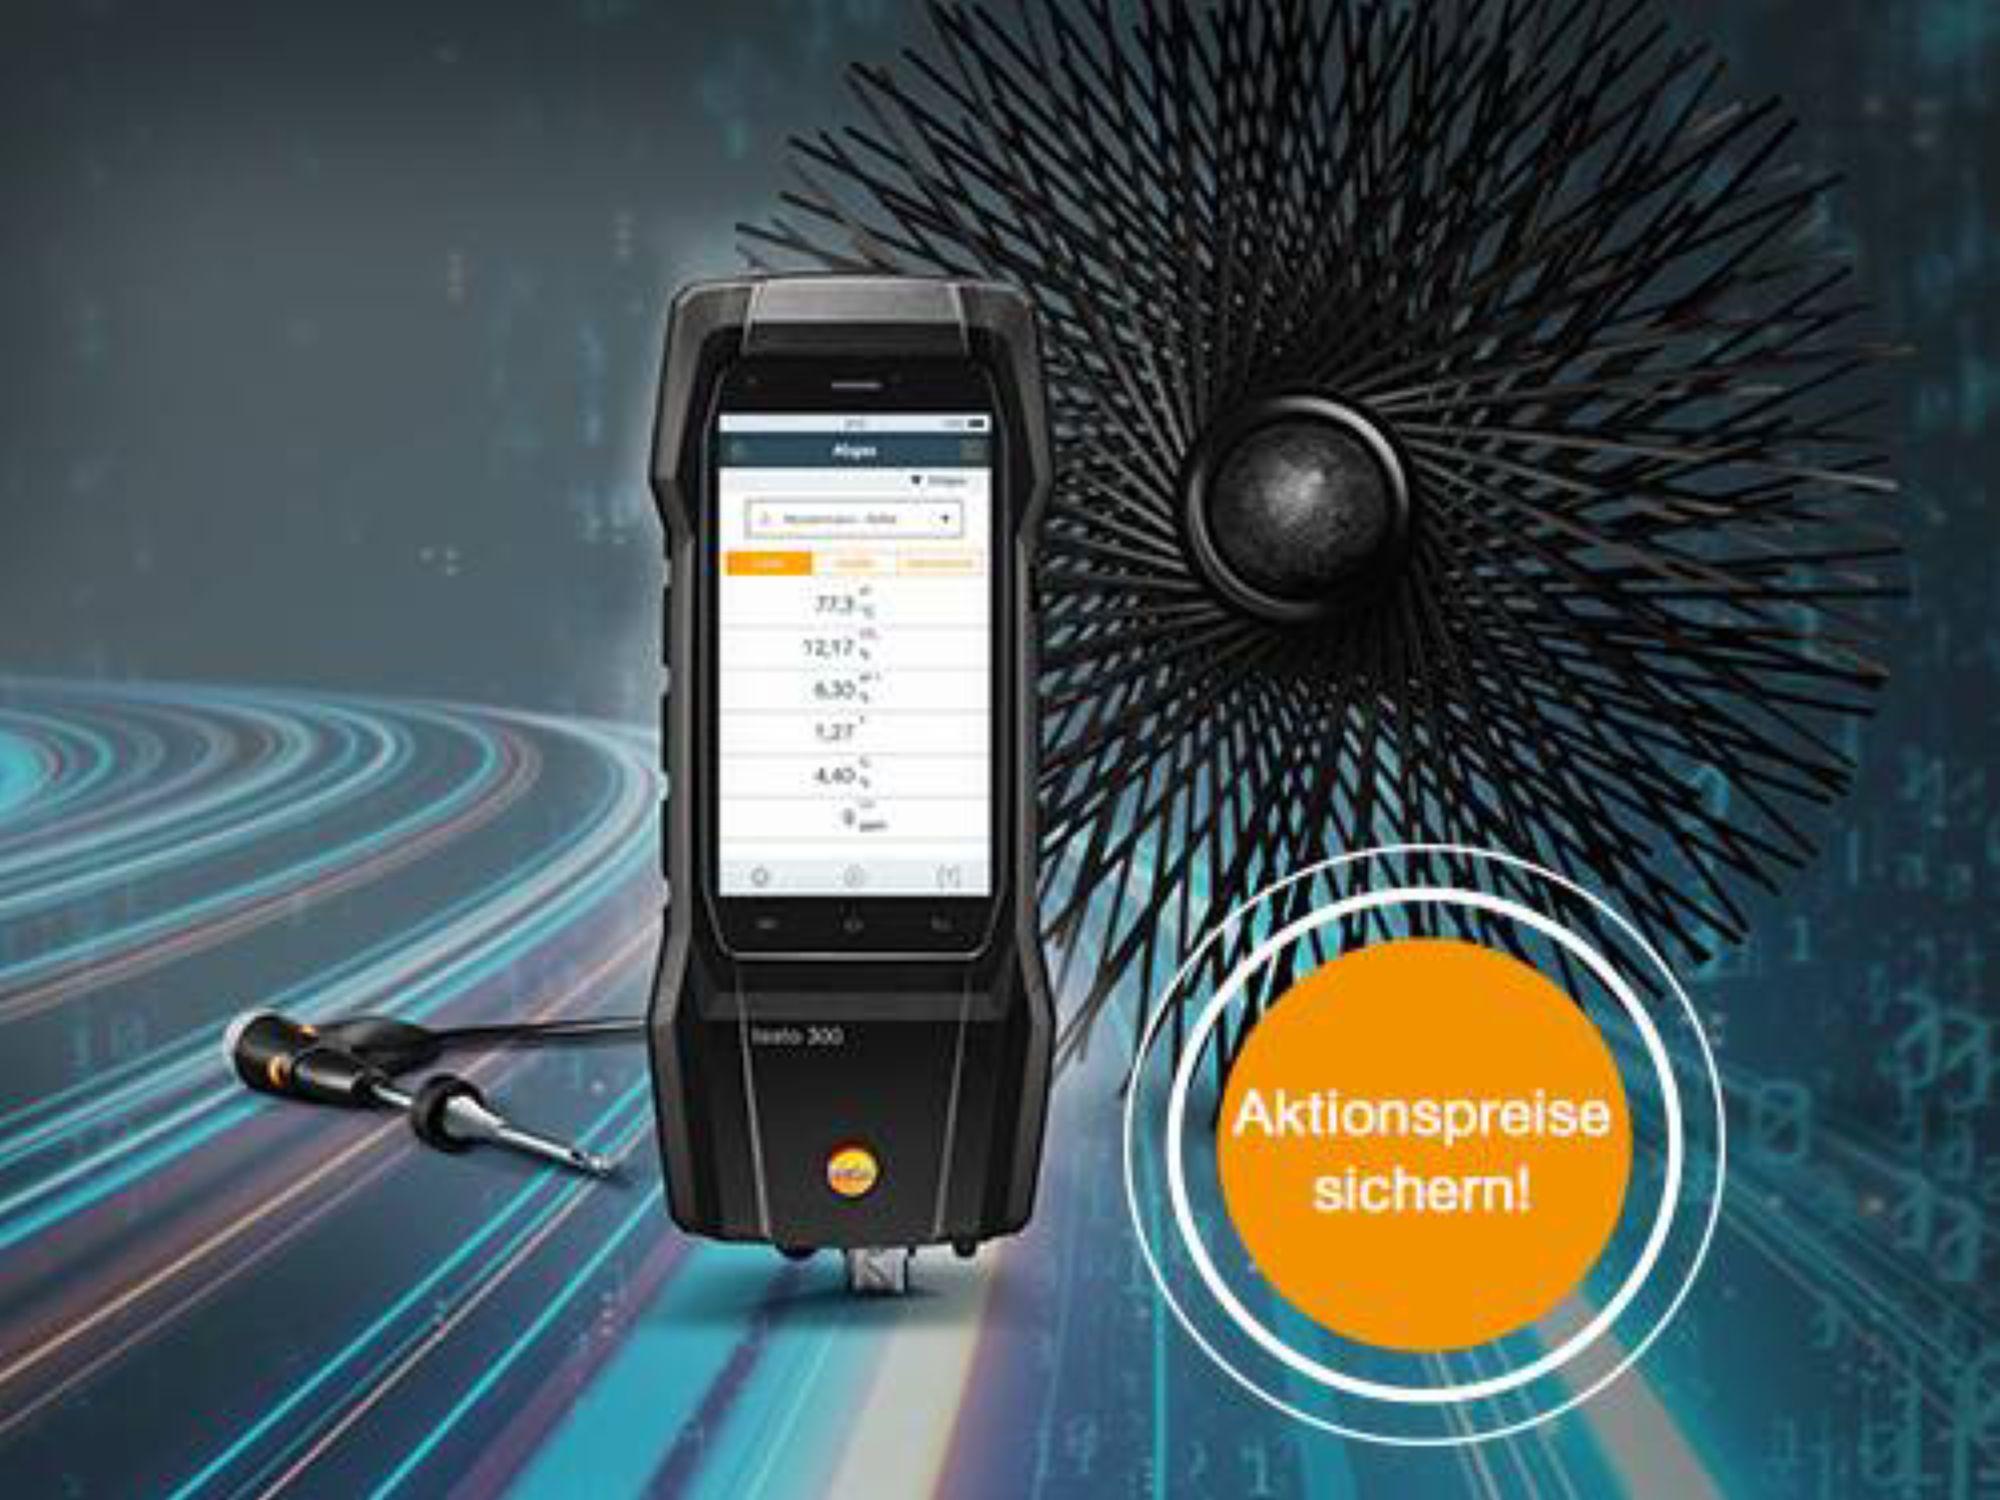 Abgas-Messgerät testo 300 SE Longllife im Set zum Aktionspreis